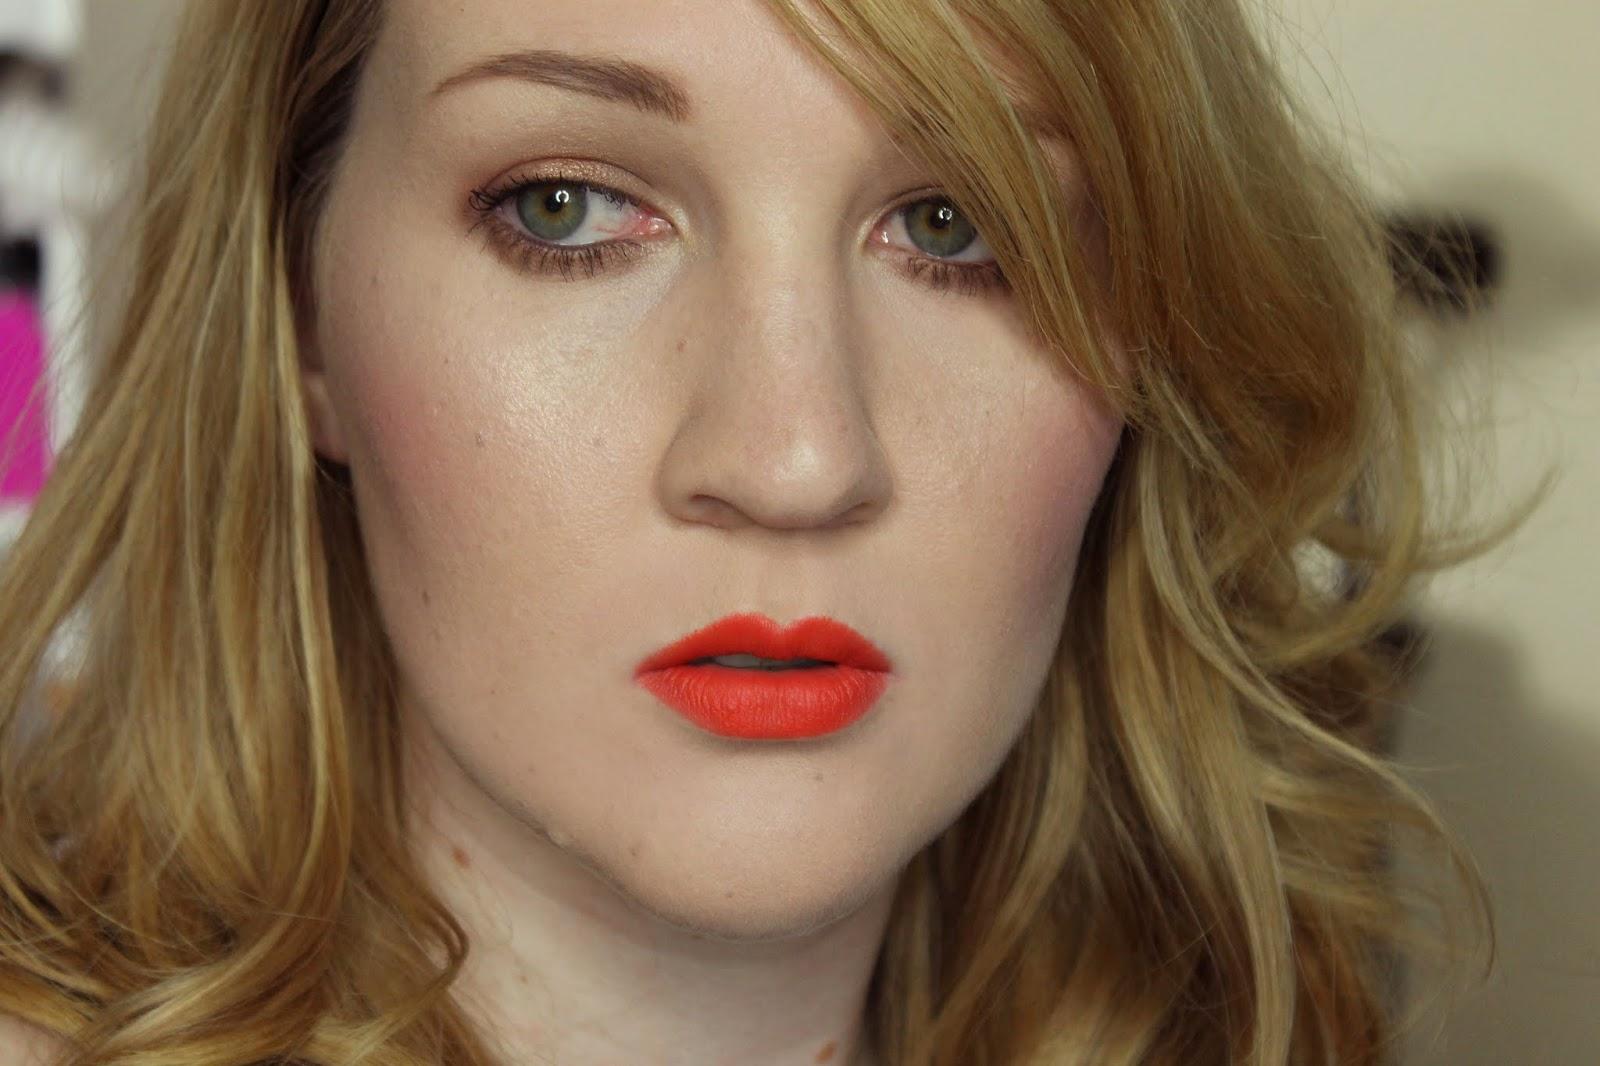 Etude House Vivid Pop Stick #7 California Girl Swatches & Review